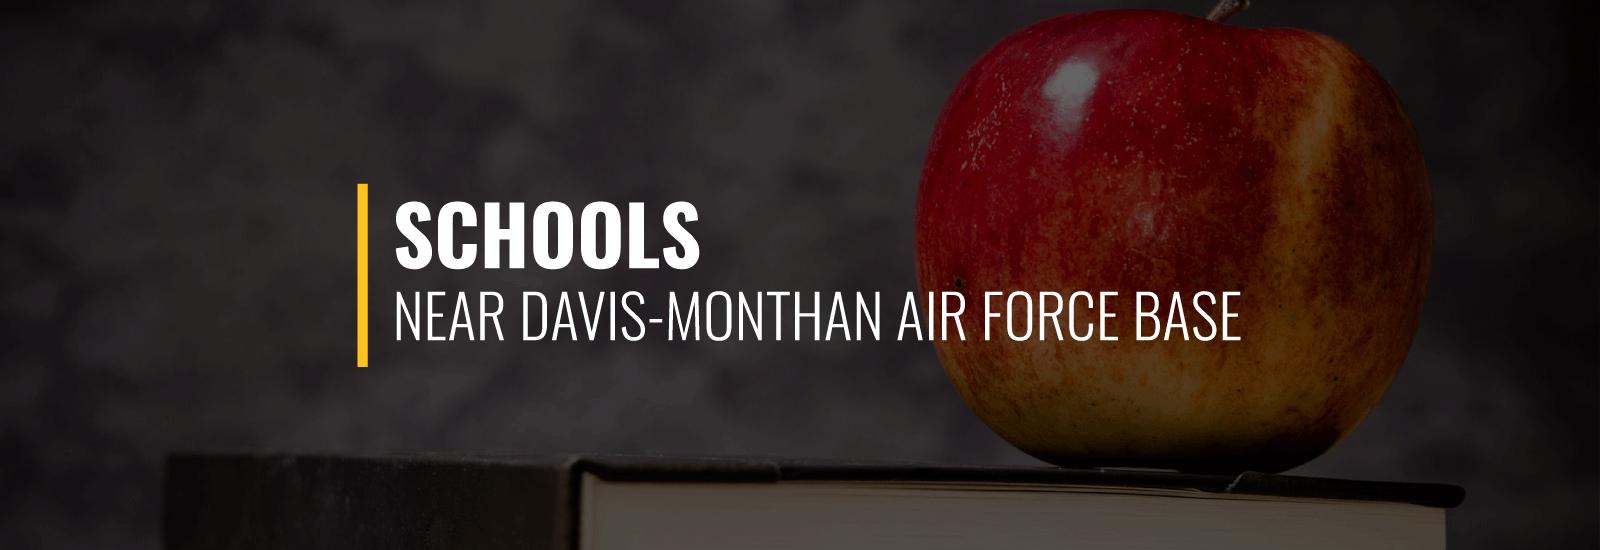 Davis-Monthan AFB Schools